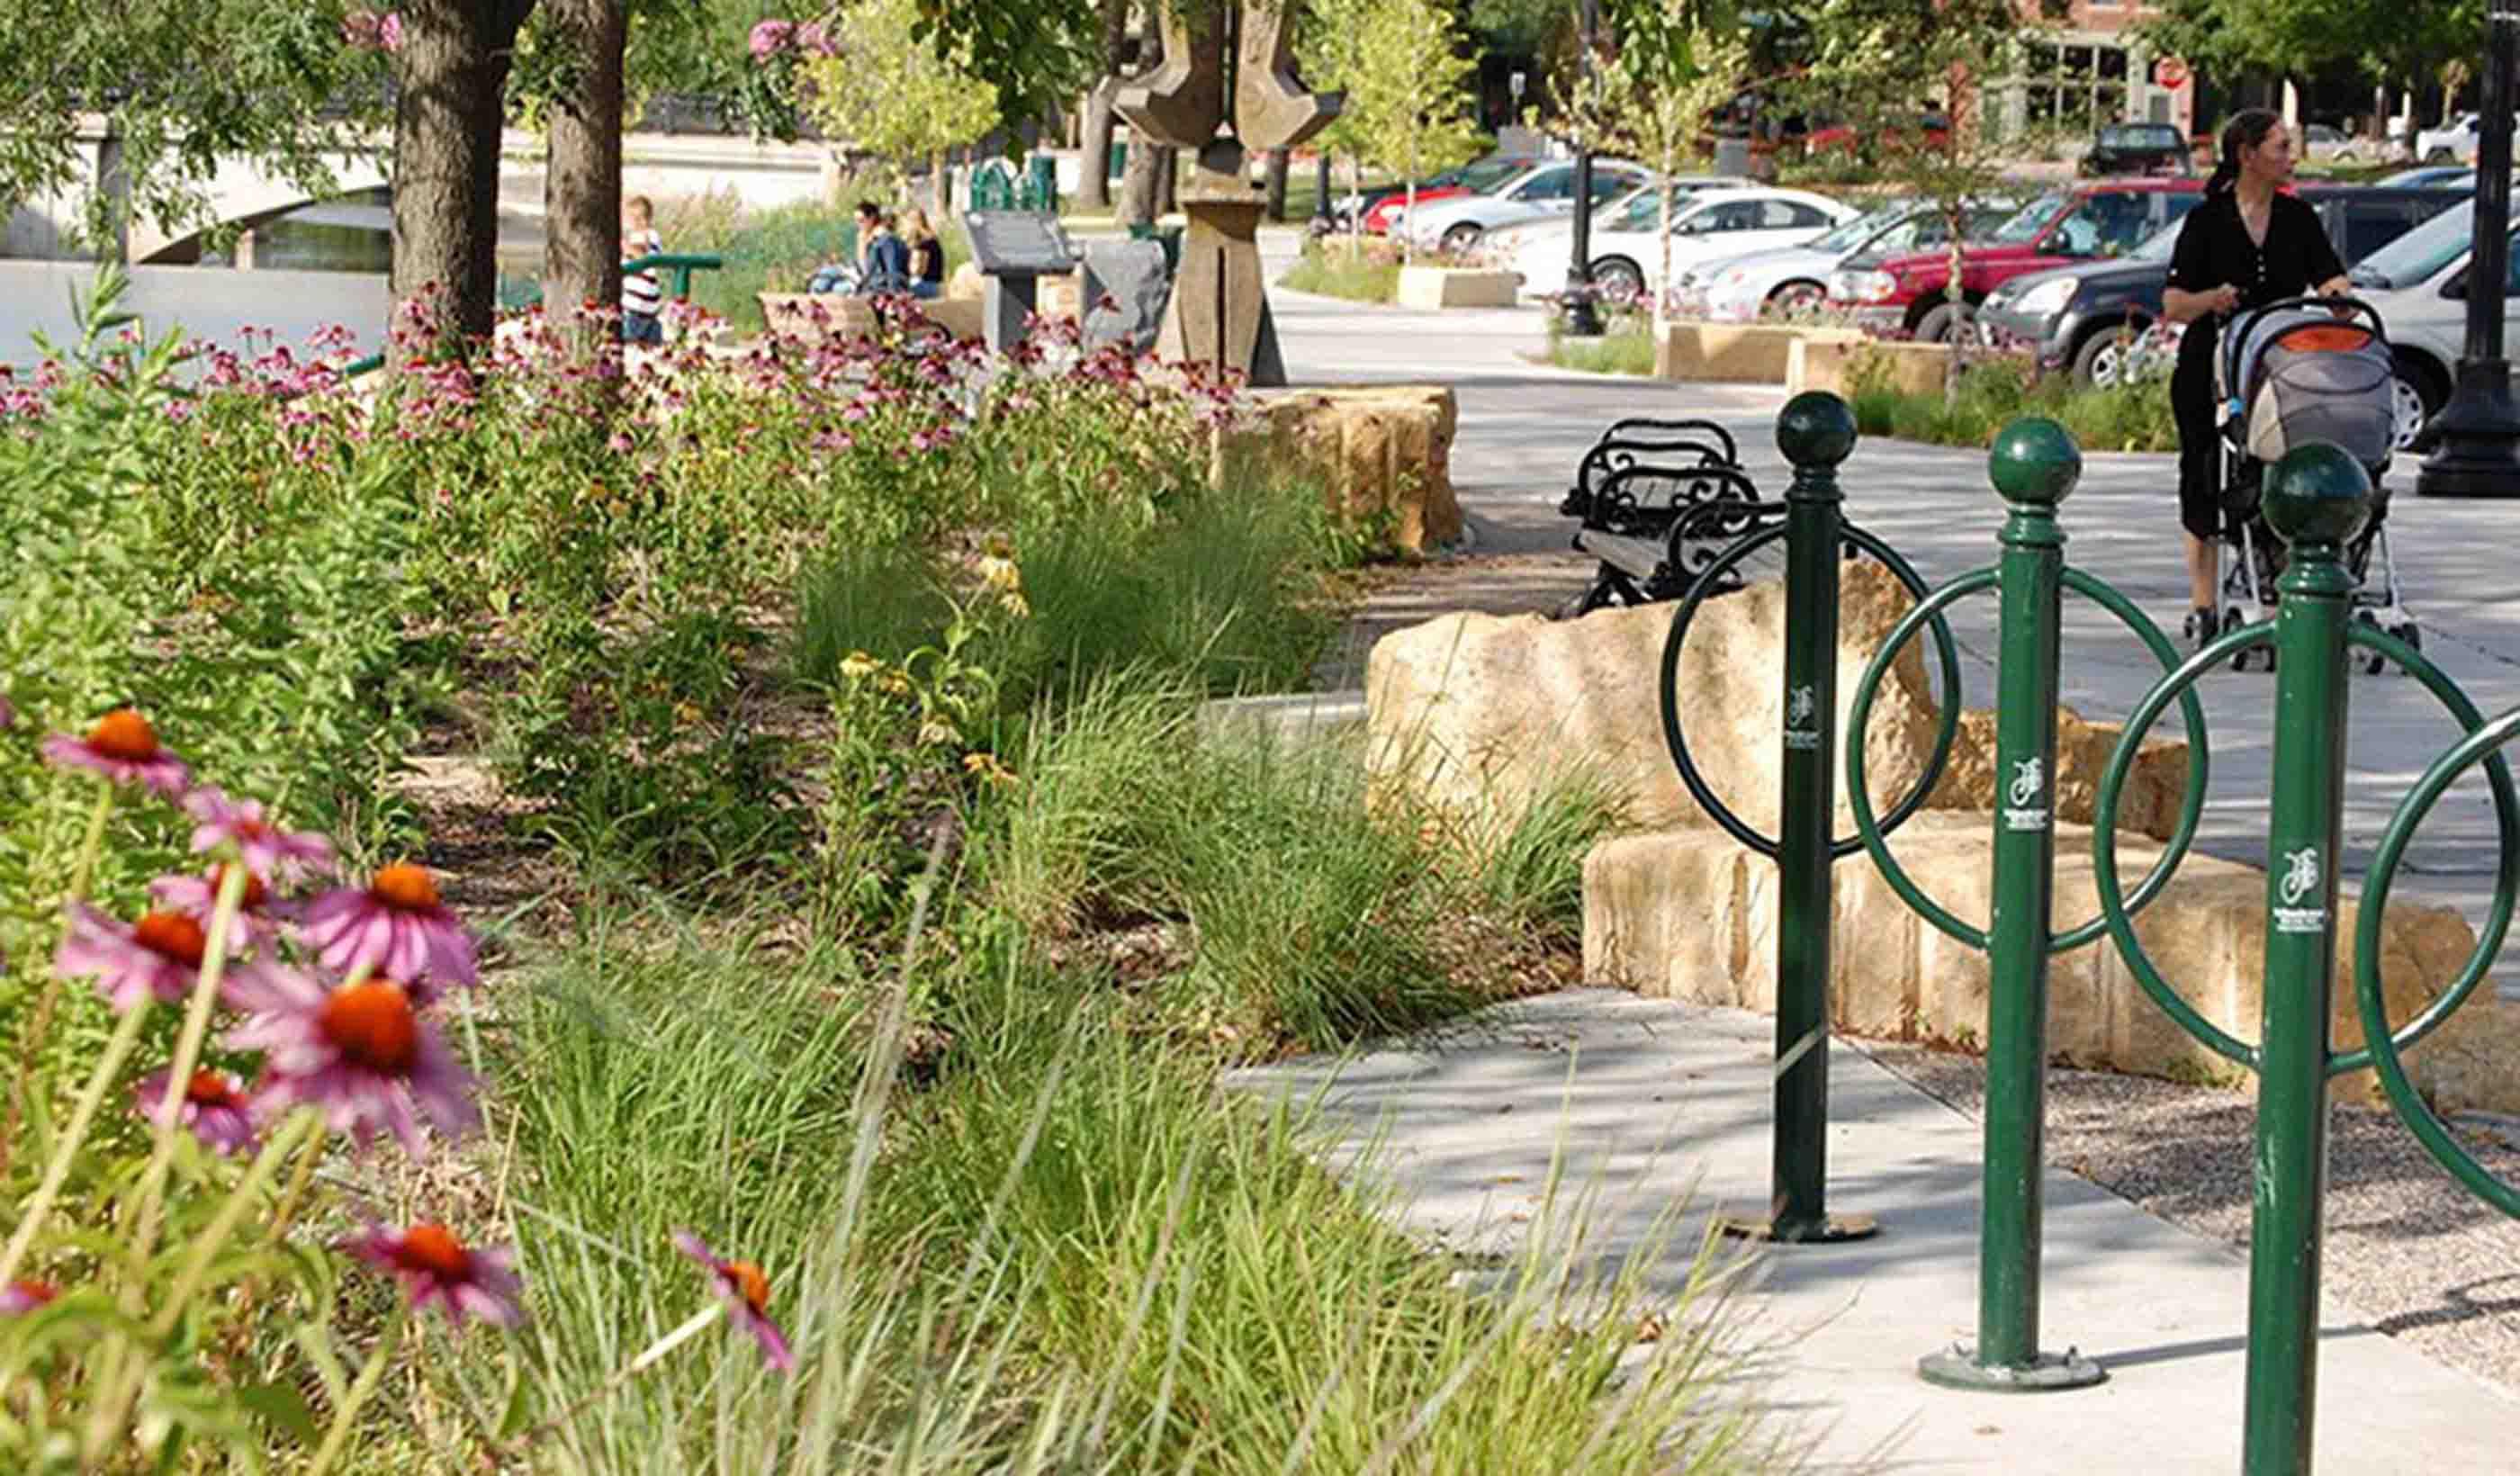 Bike racks along landscaped sidewalk